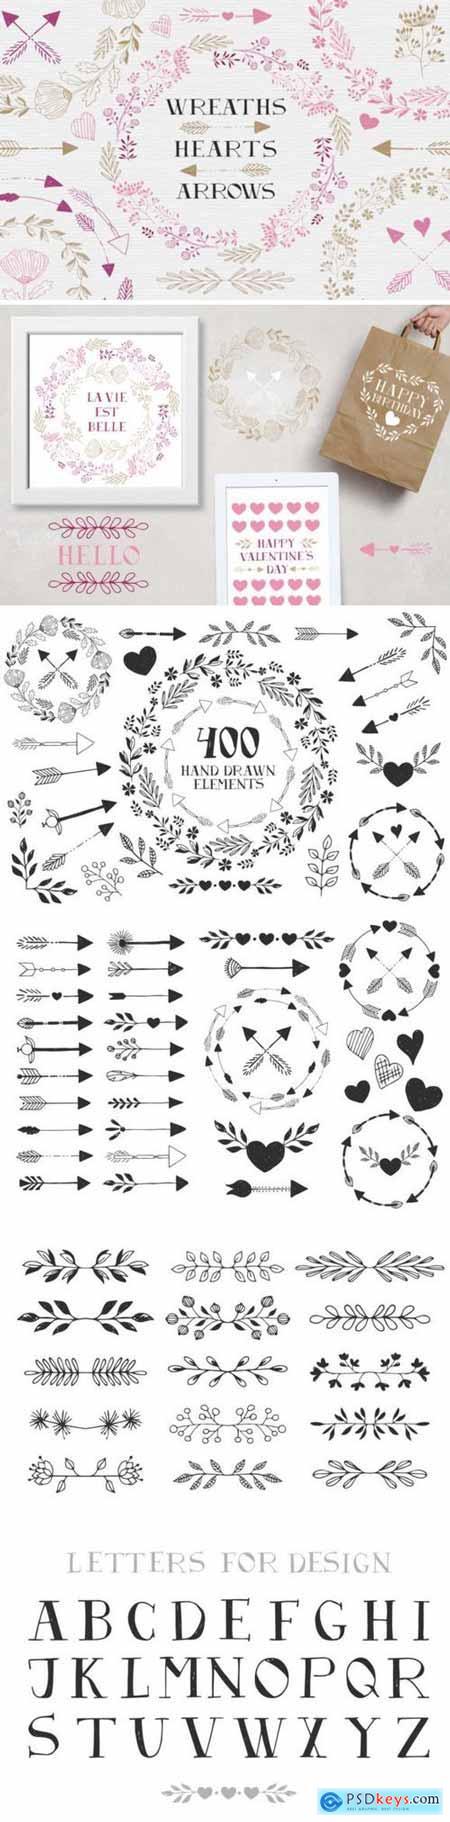 Creativemarket Wreaths, hearts, arrows - EPS & PNG